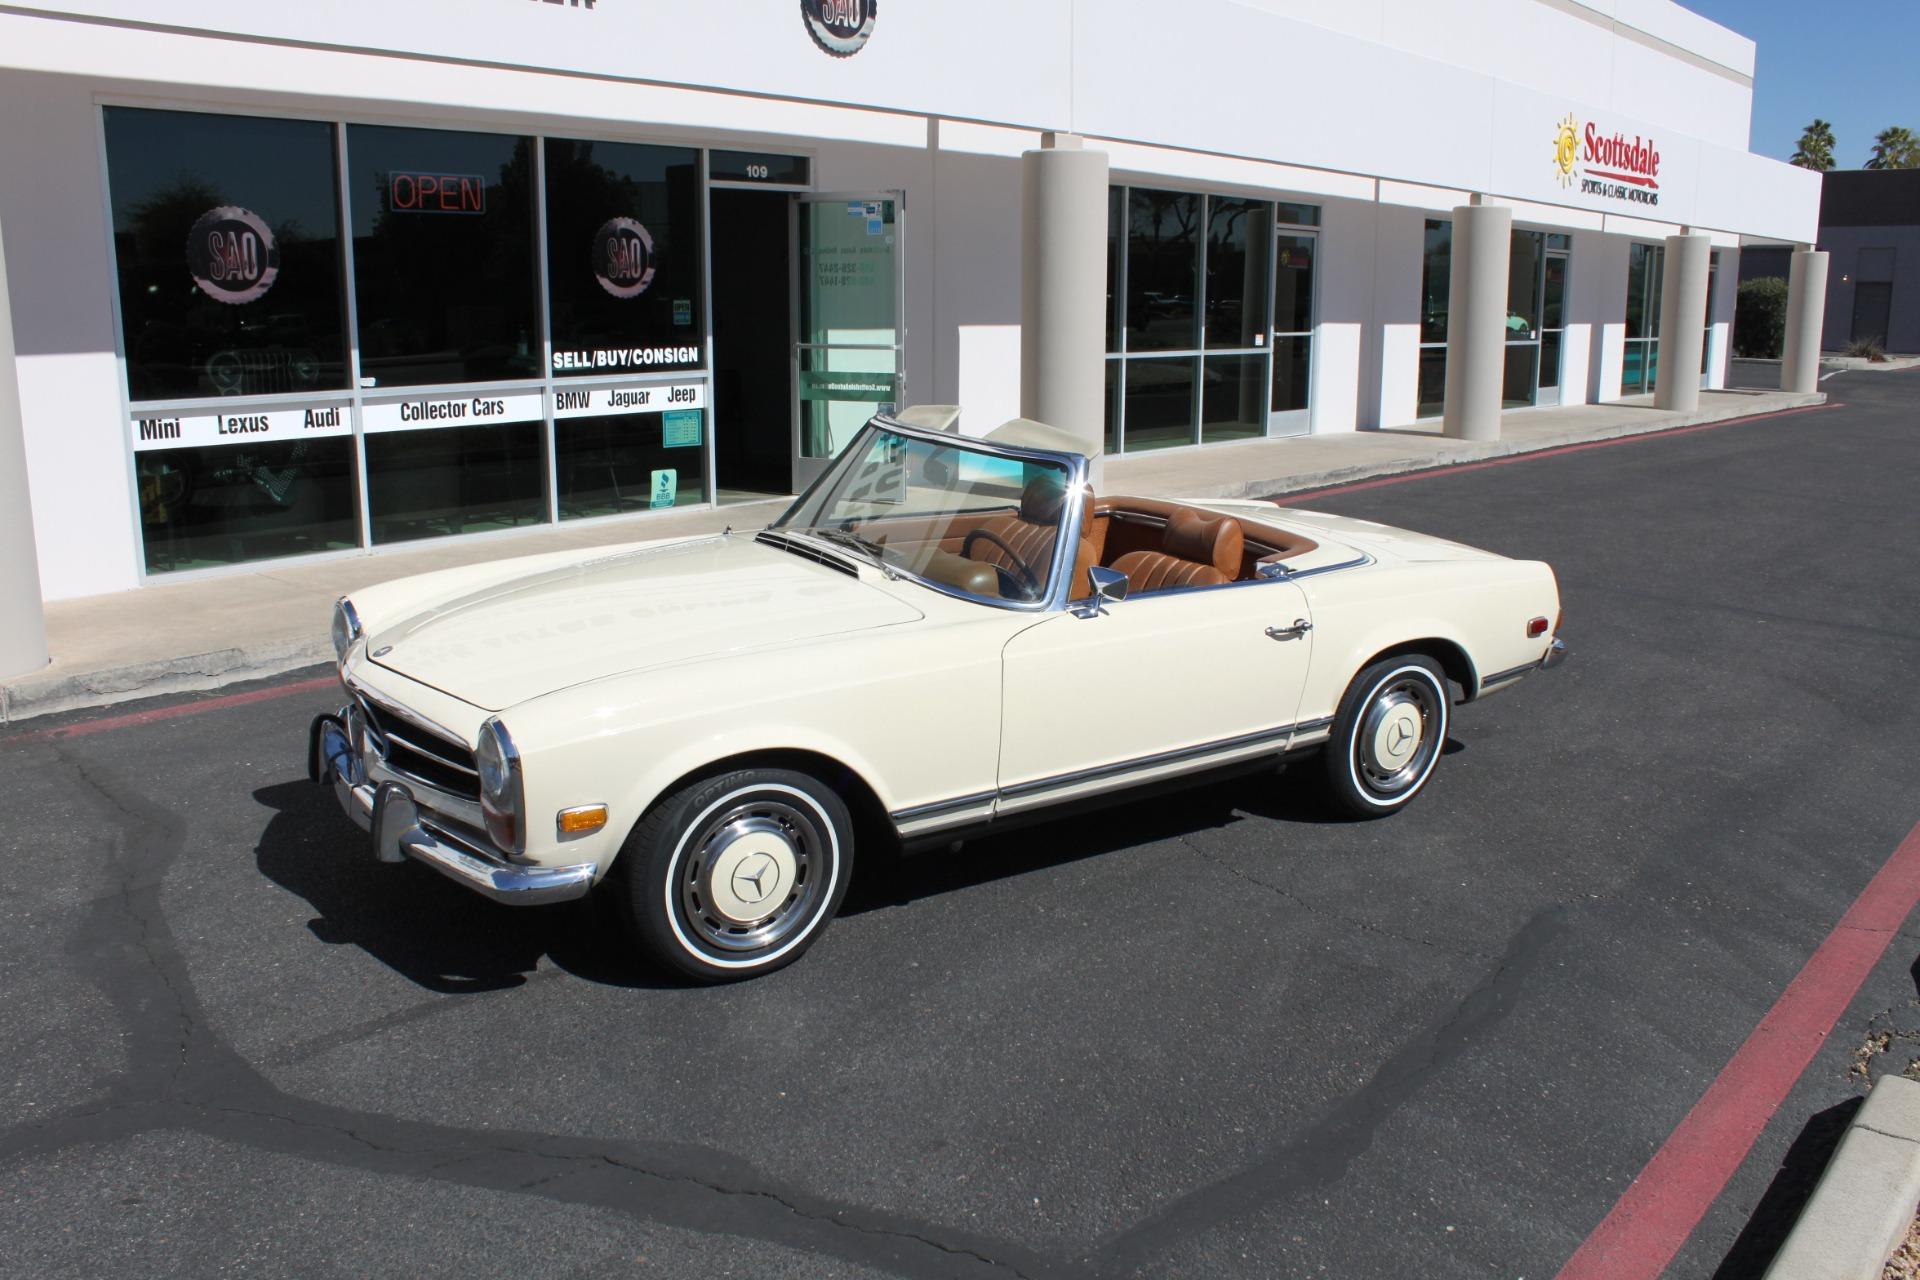 Used-1971-Mercedes-Benz-280SL-Convertible-vintage